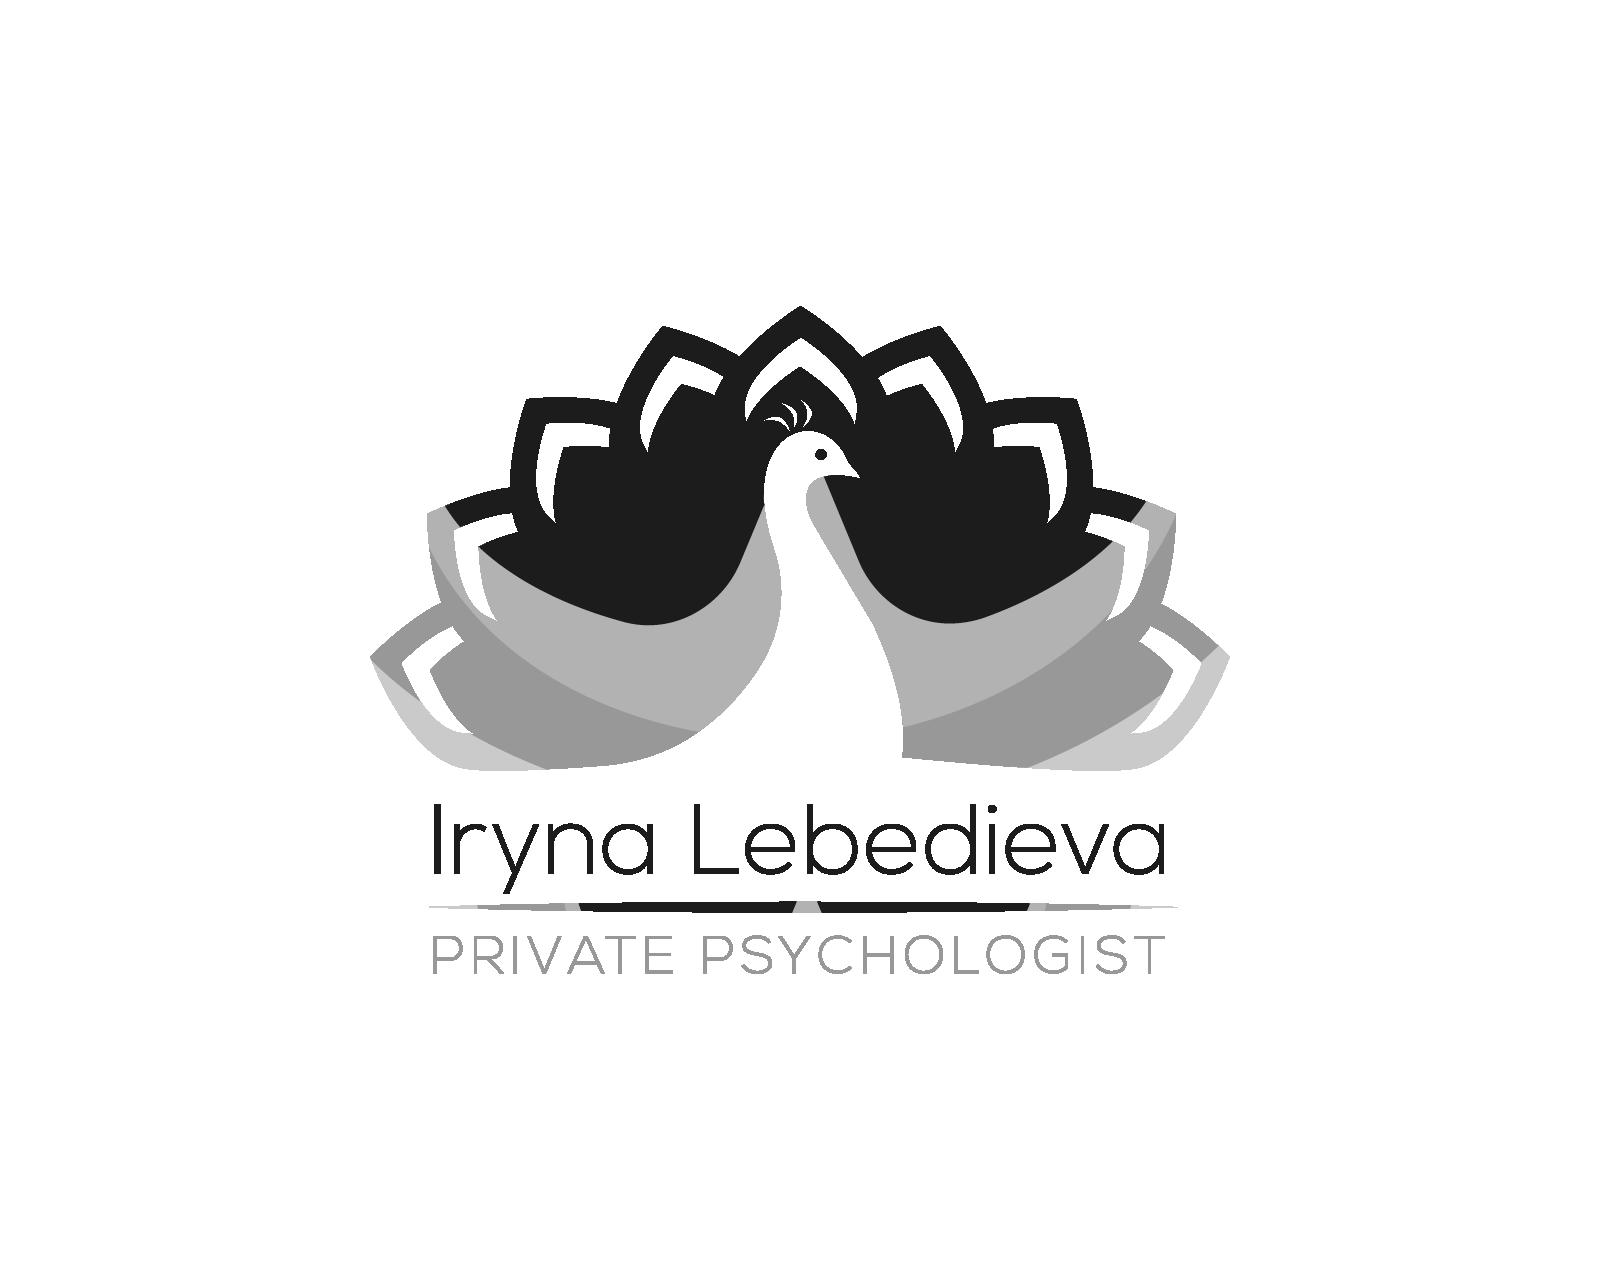 Iryna Lebedieva Logo design 3